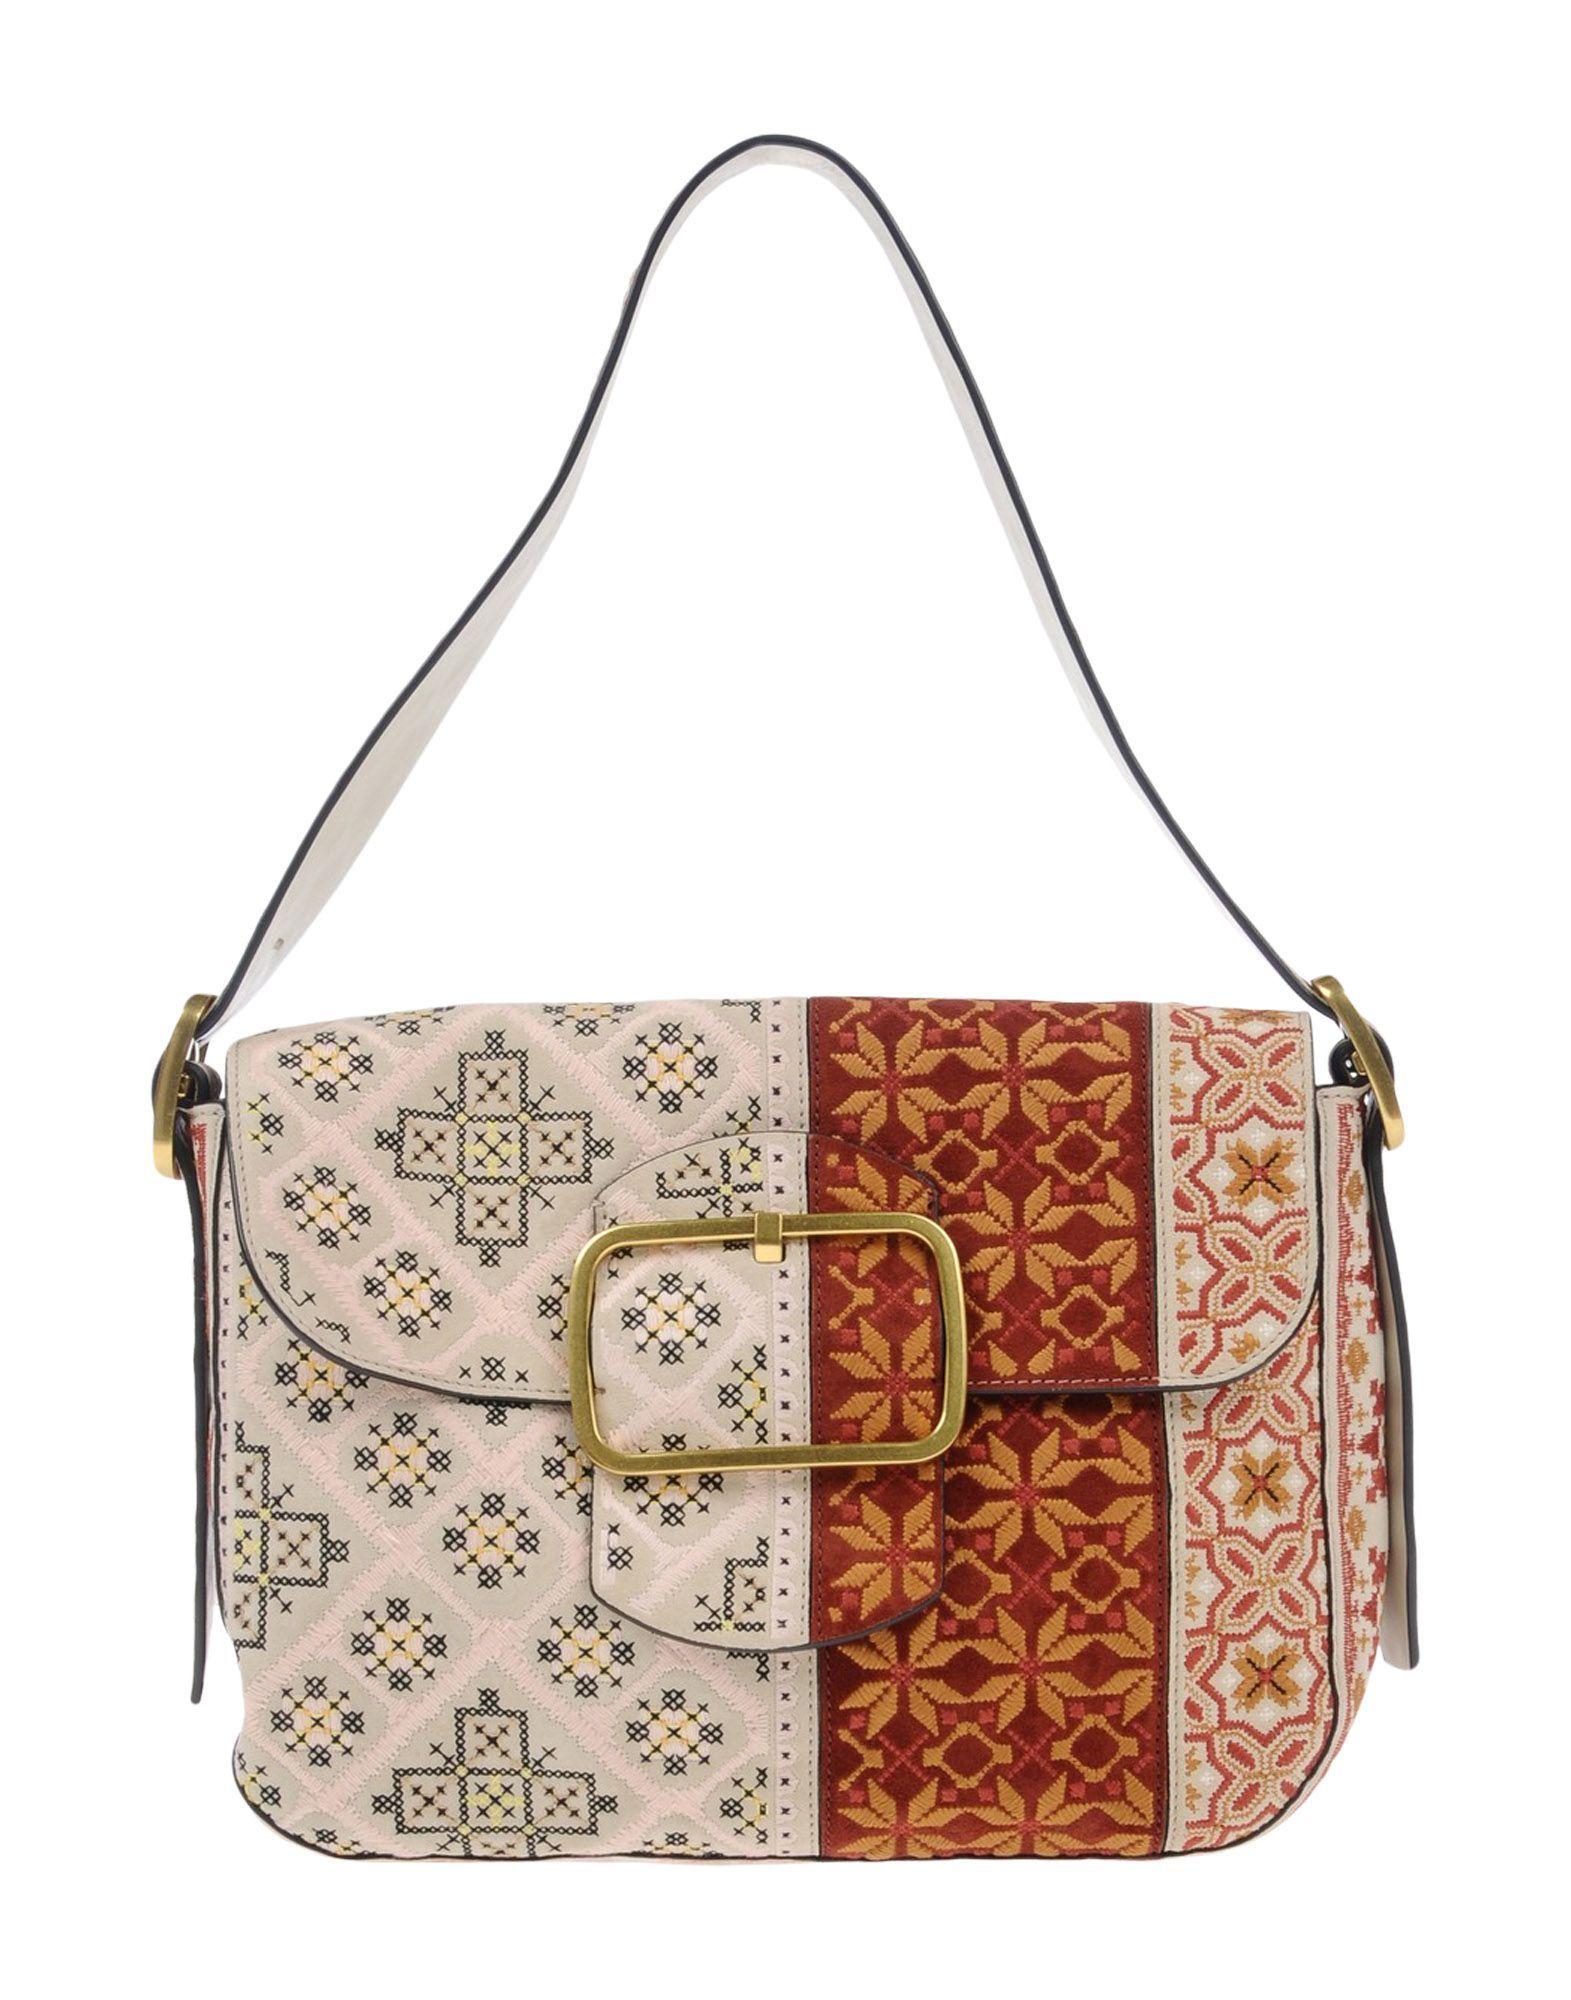 Tory Burch Handbags Toryburch Bags Leather Hand Satchel